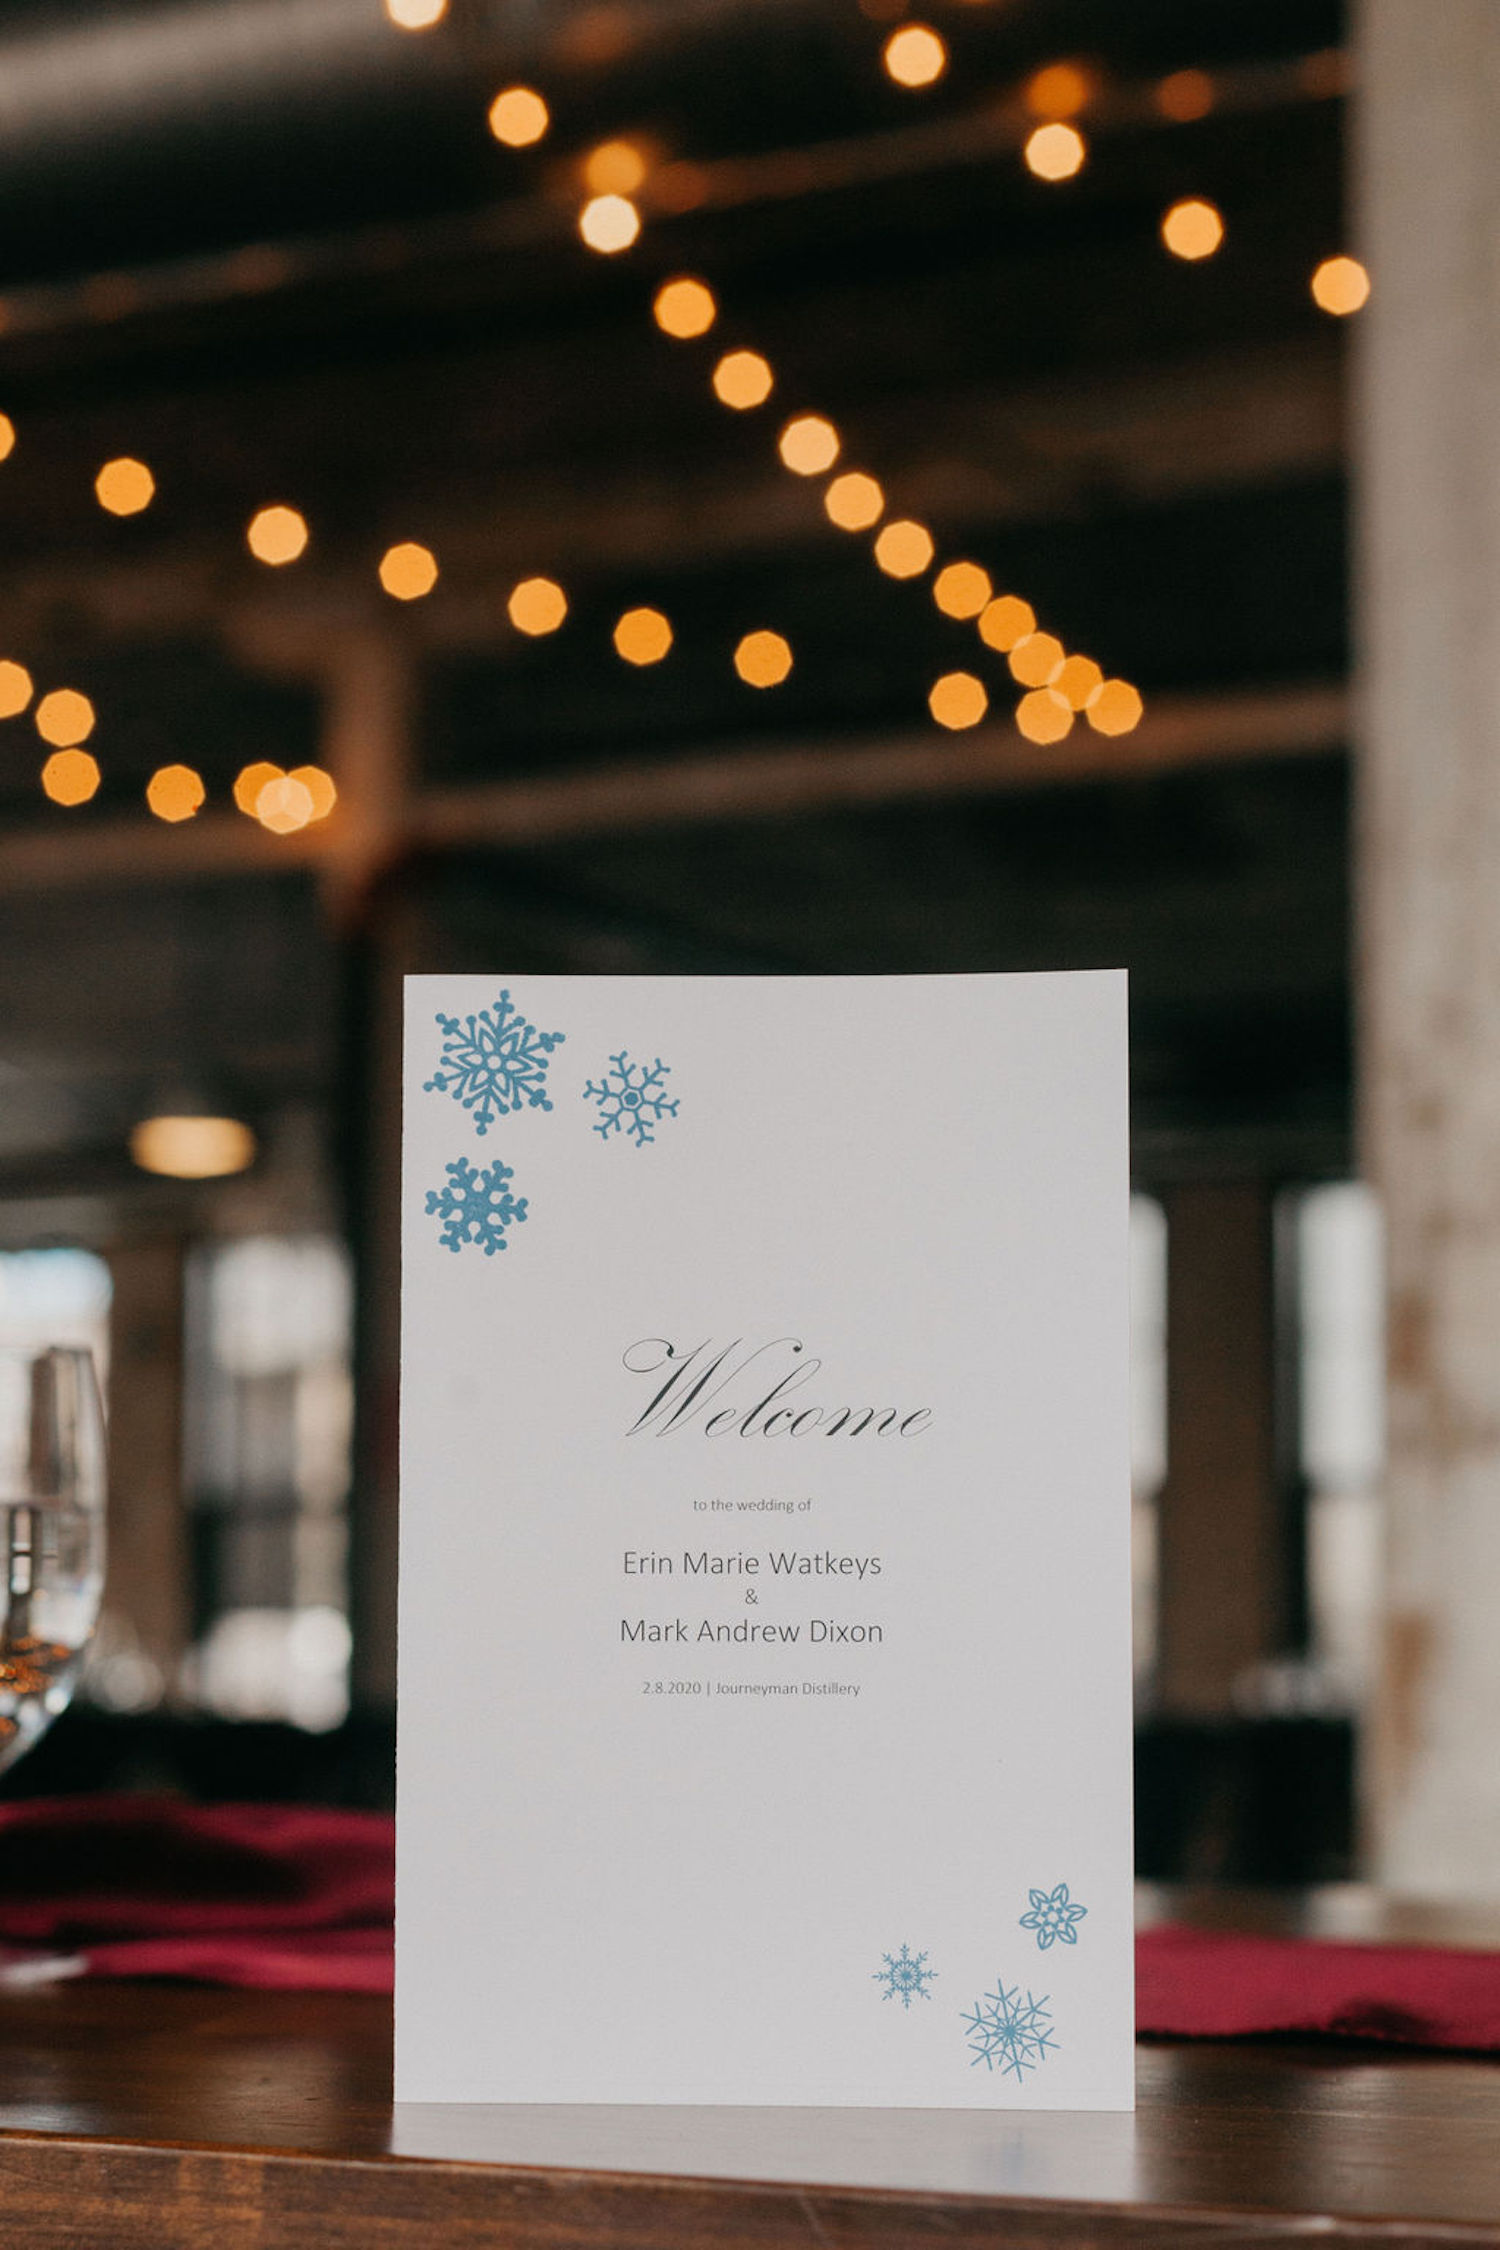 Welcome sign for Journeyman Distillery wedding